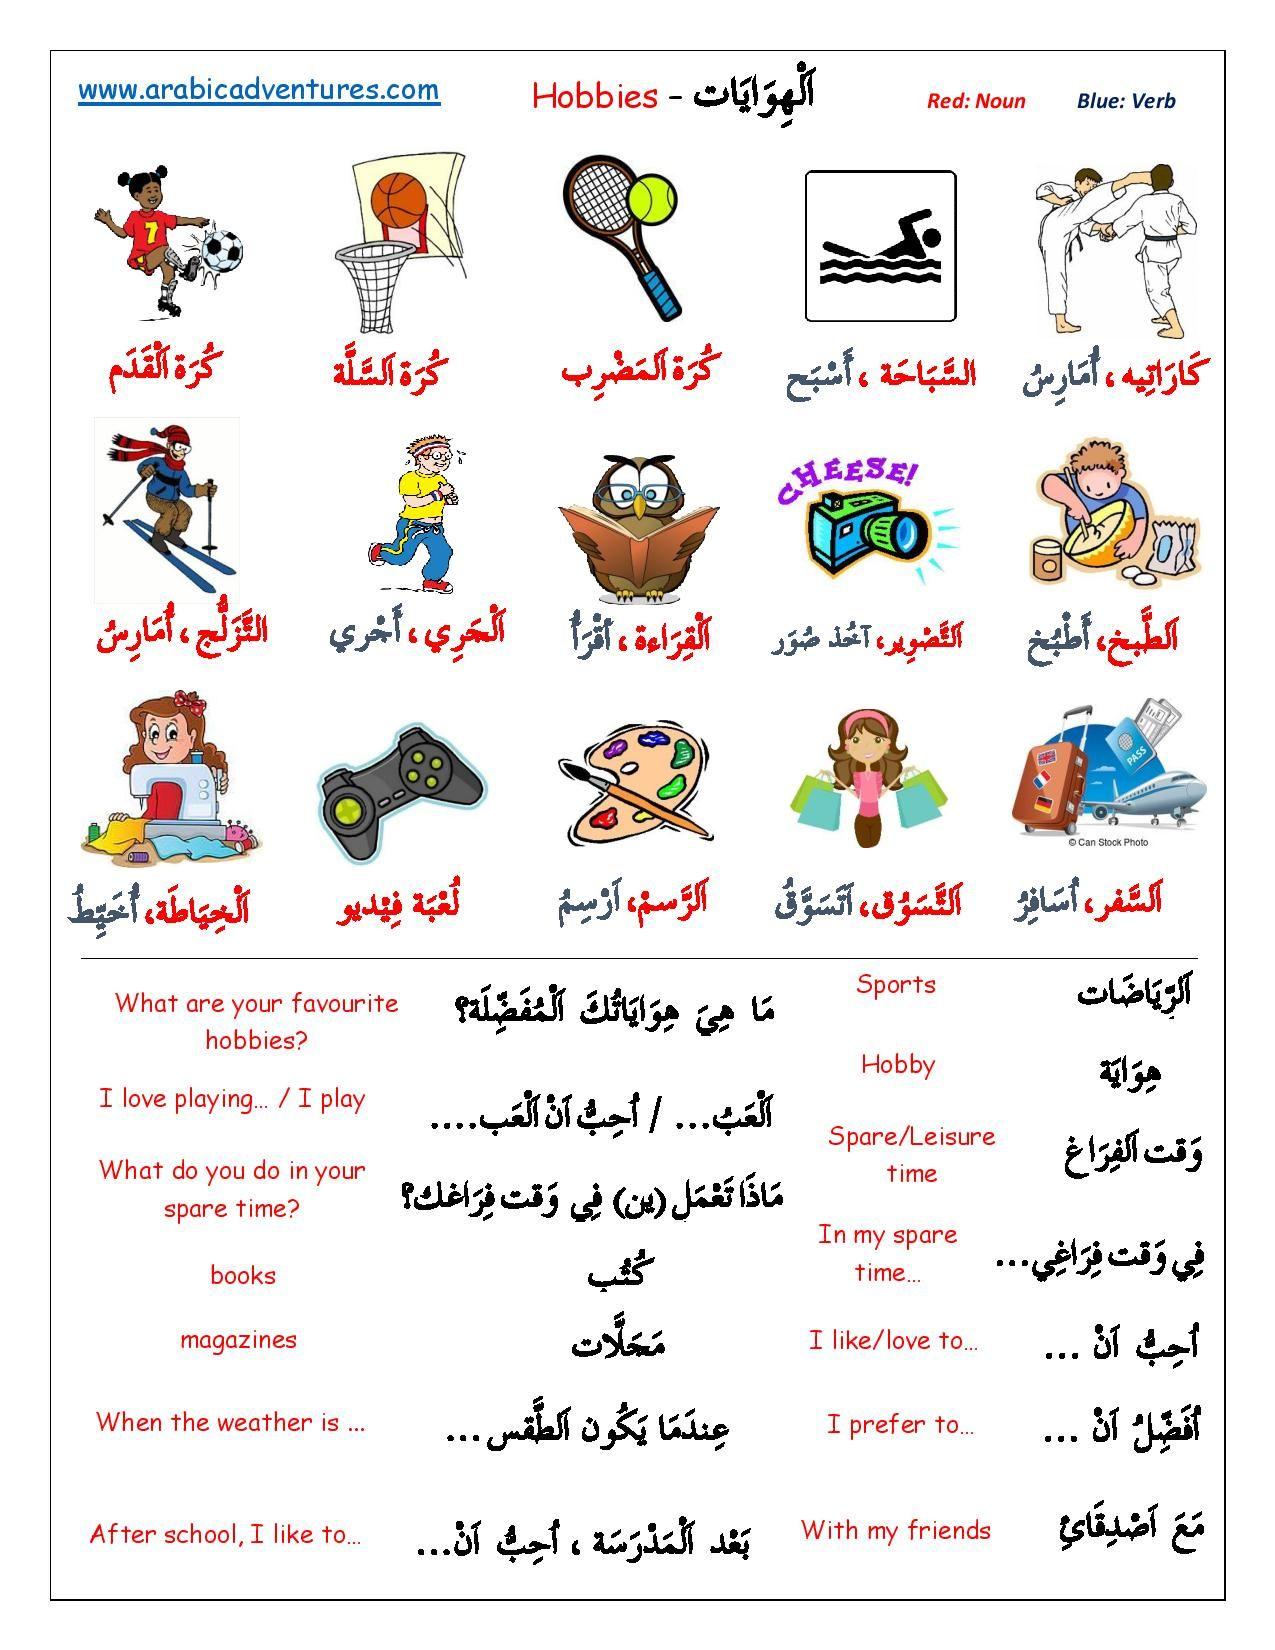 Spoken Arabic Hobbies